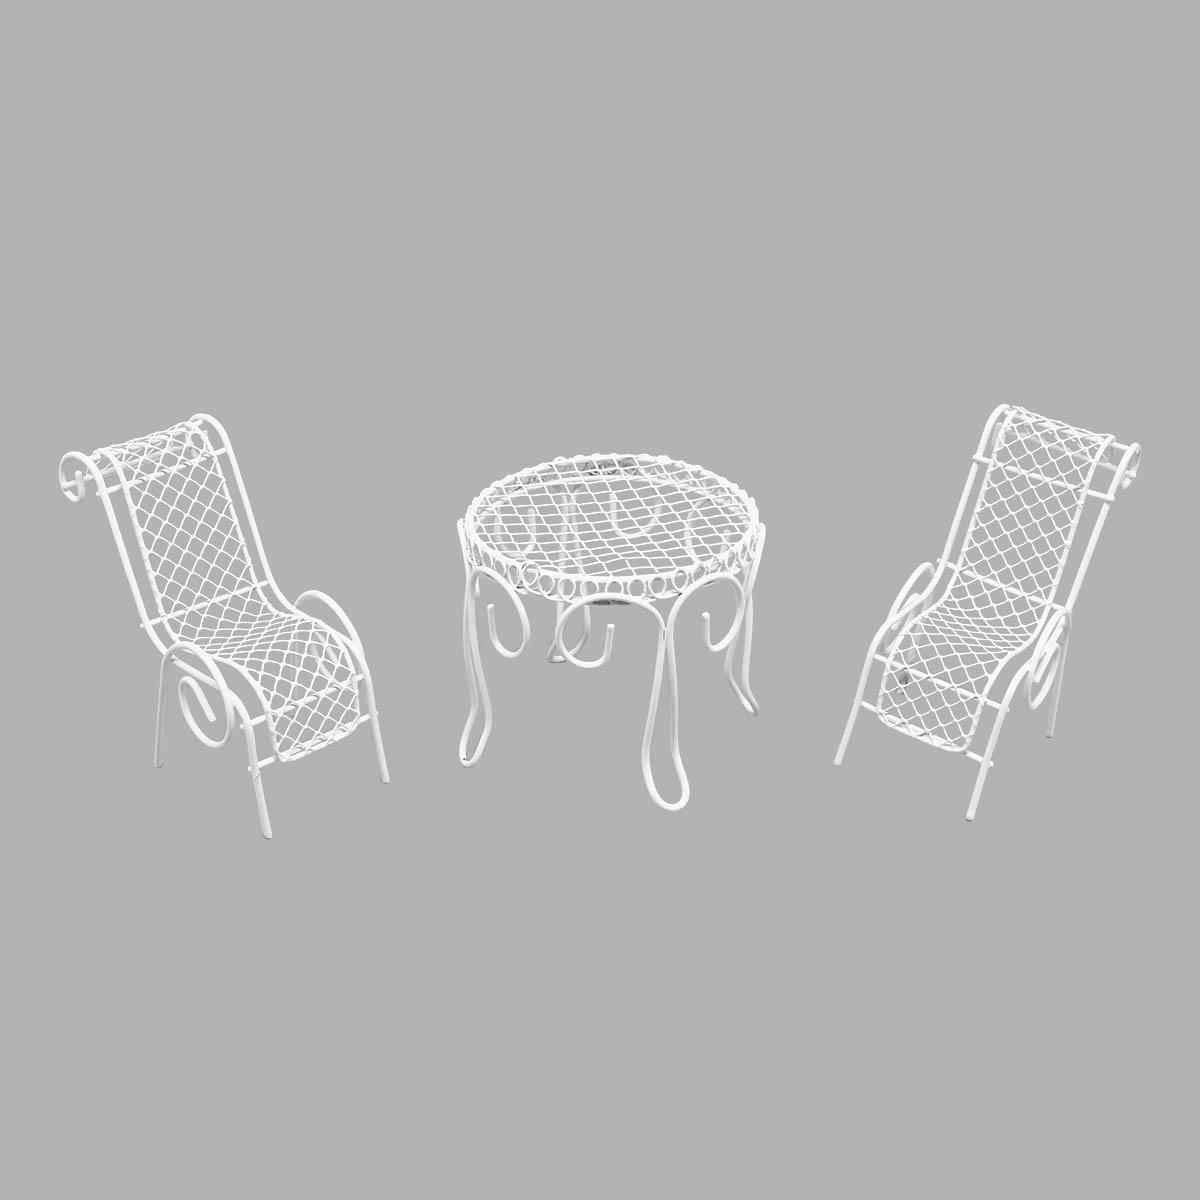 Мебель для куклы, 3 предмета (шезлонг 2шт, стол), Астра